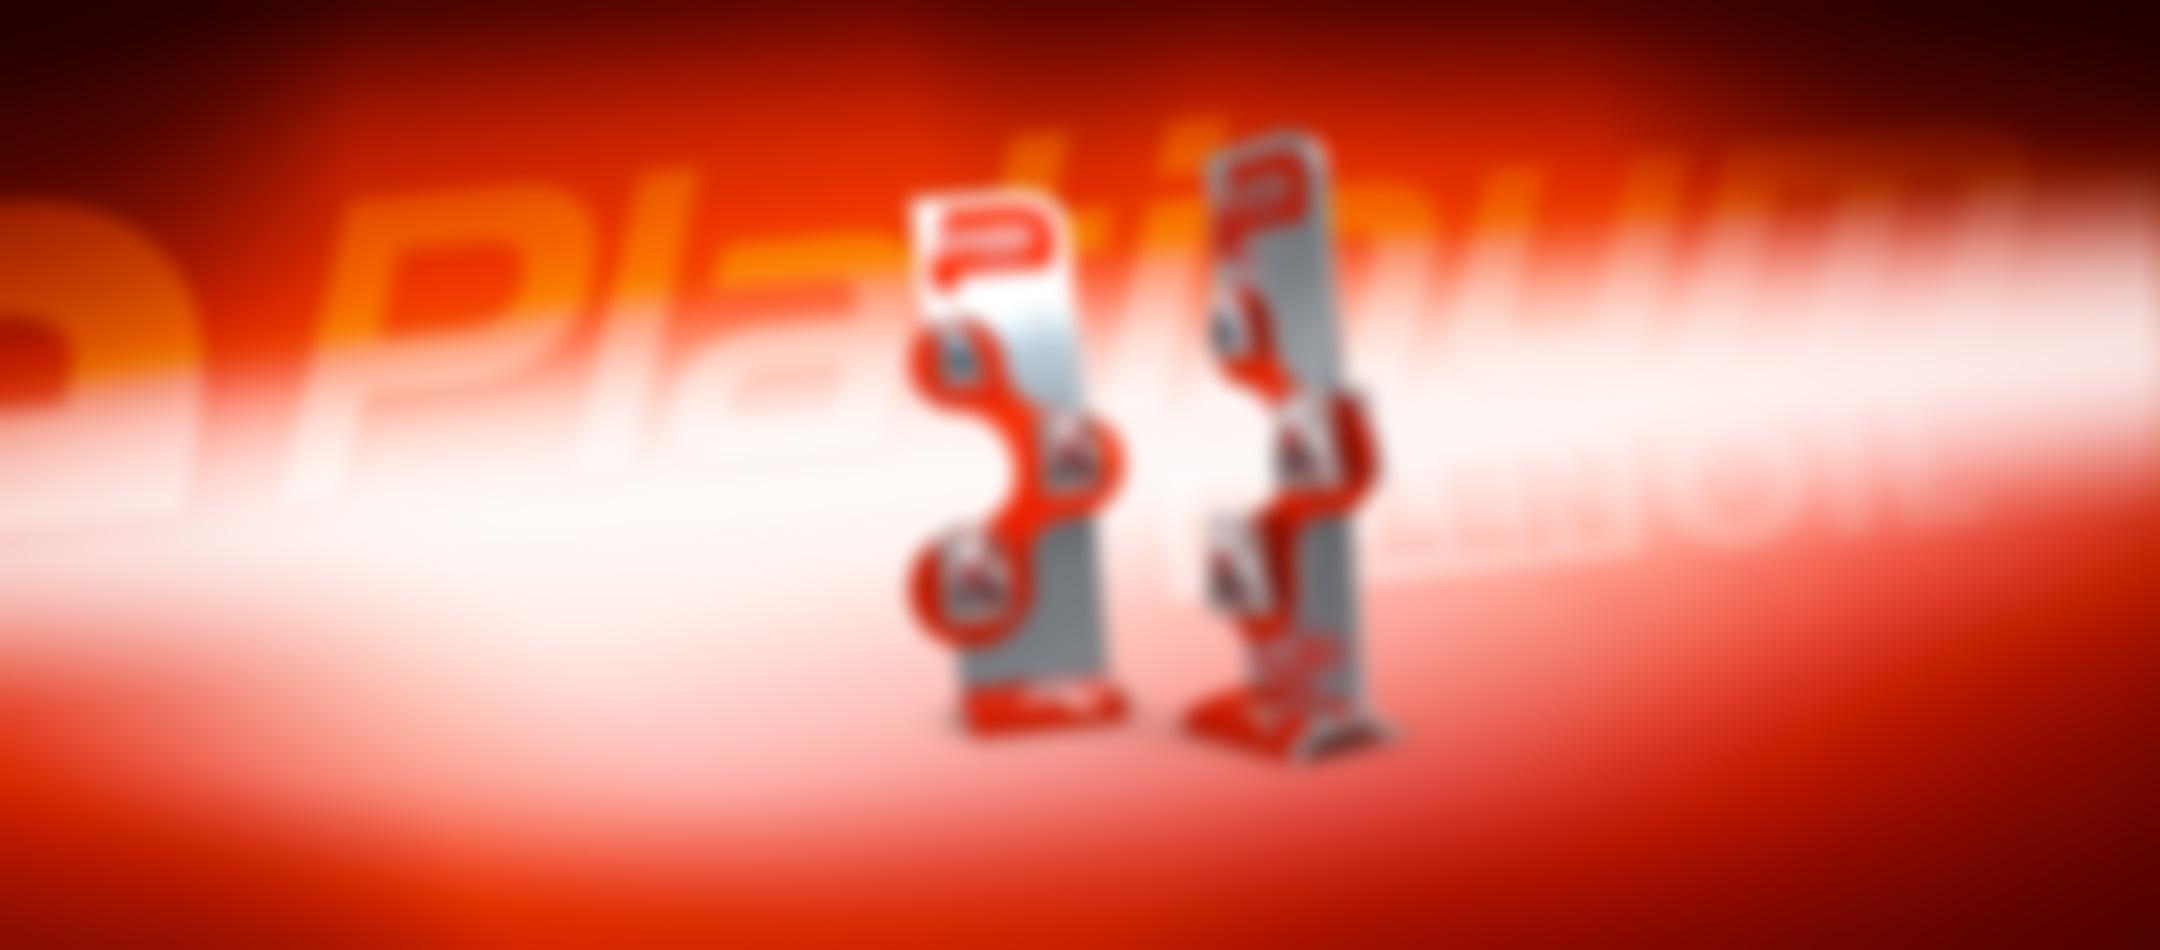 Bg blur